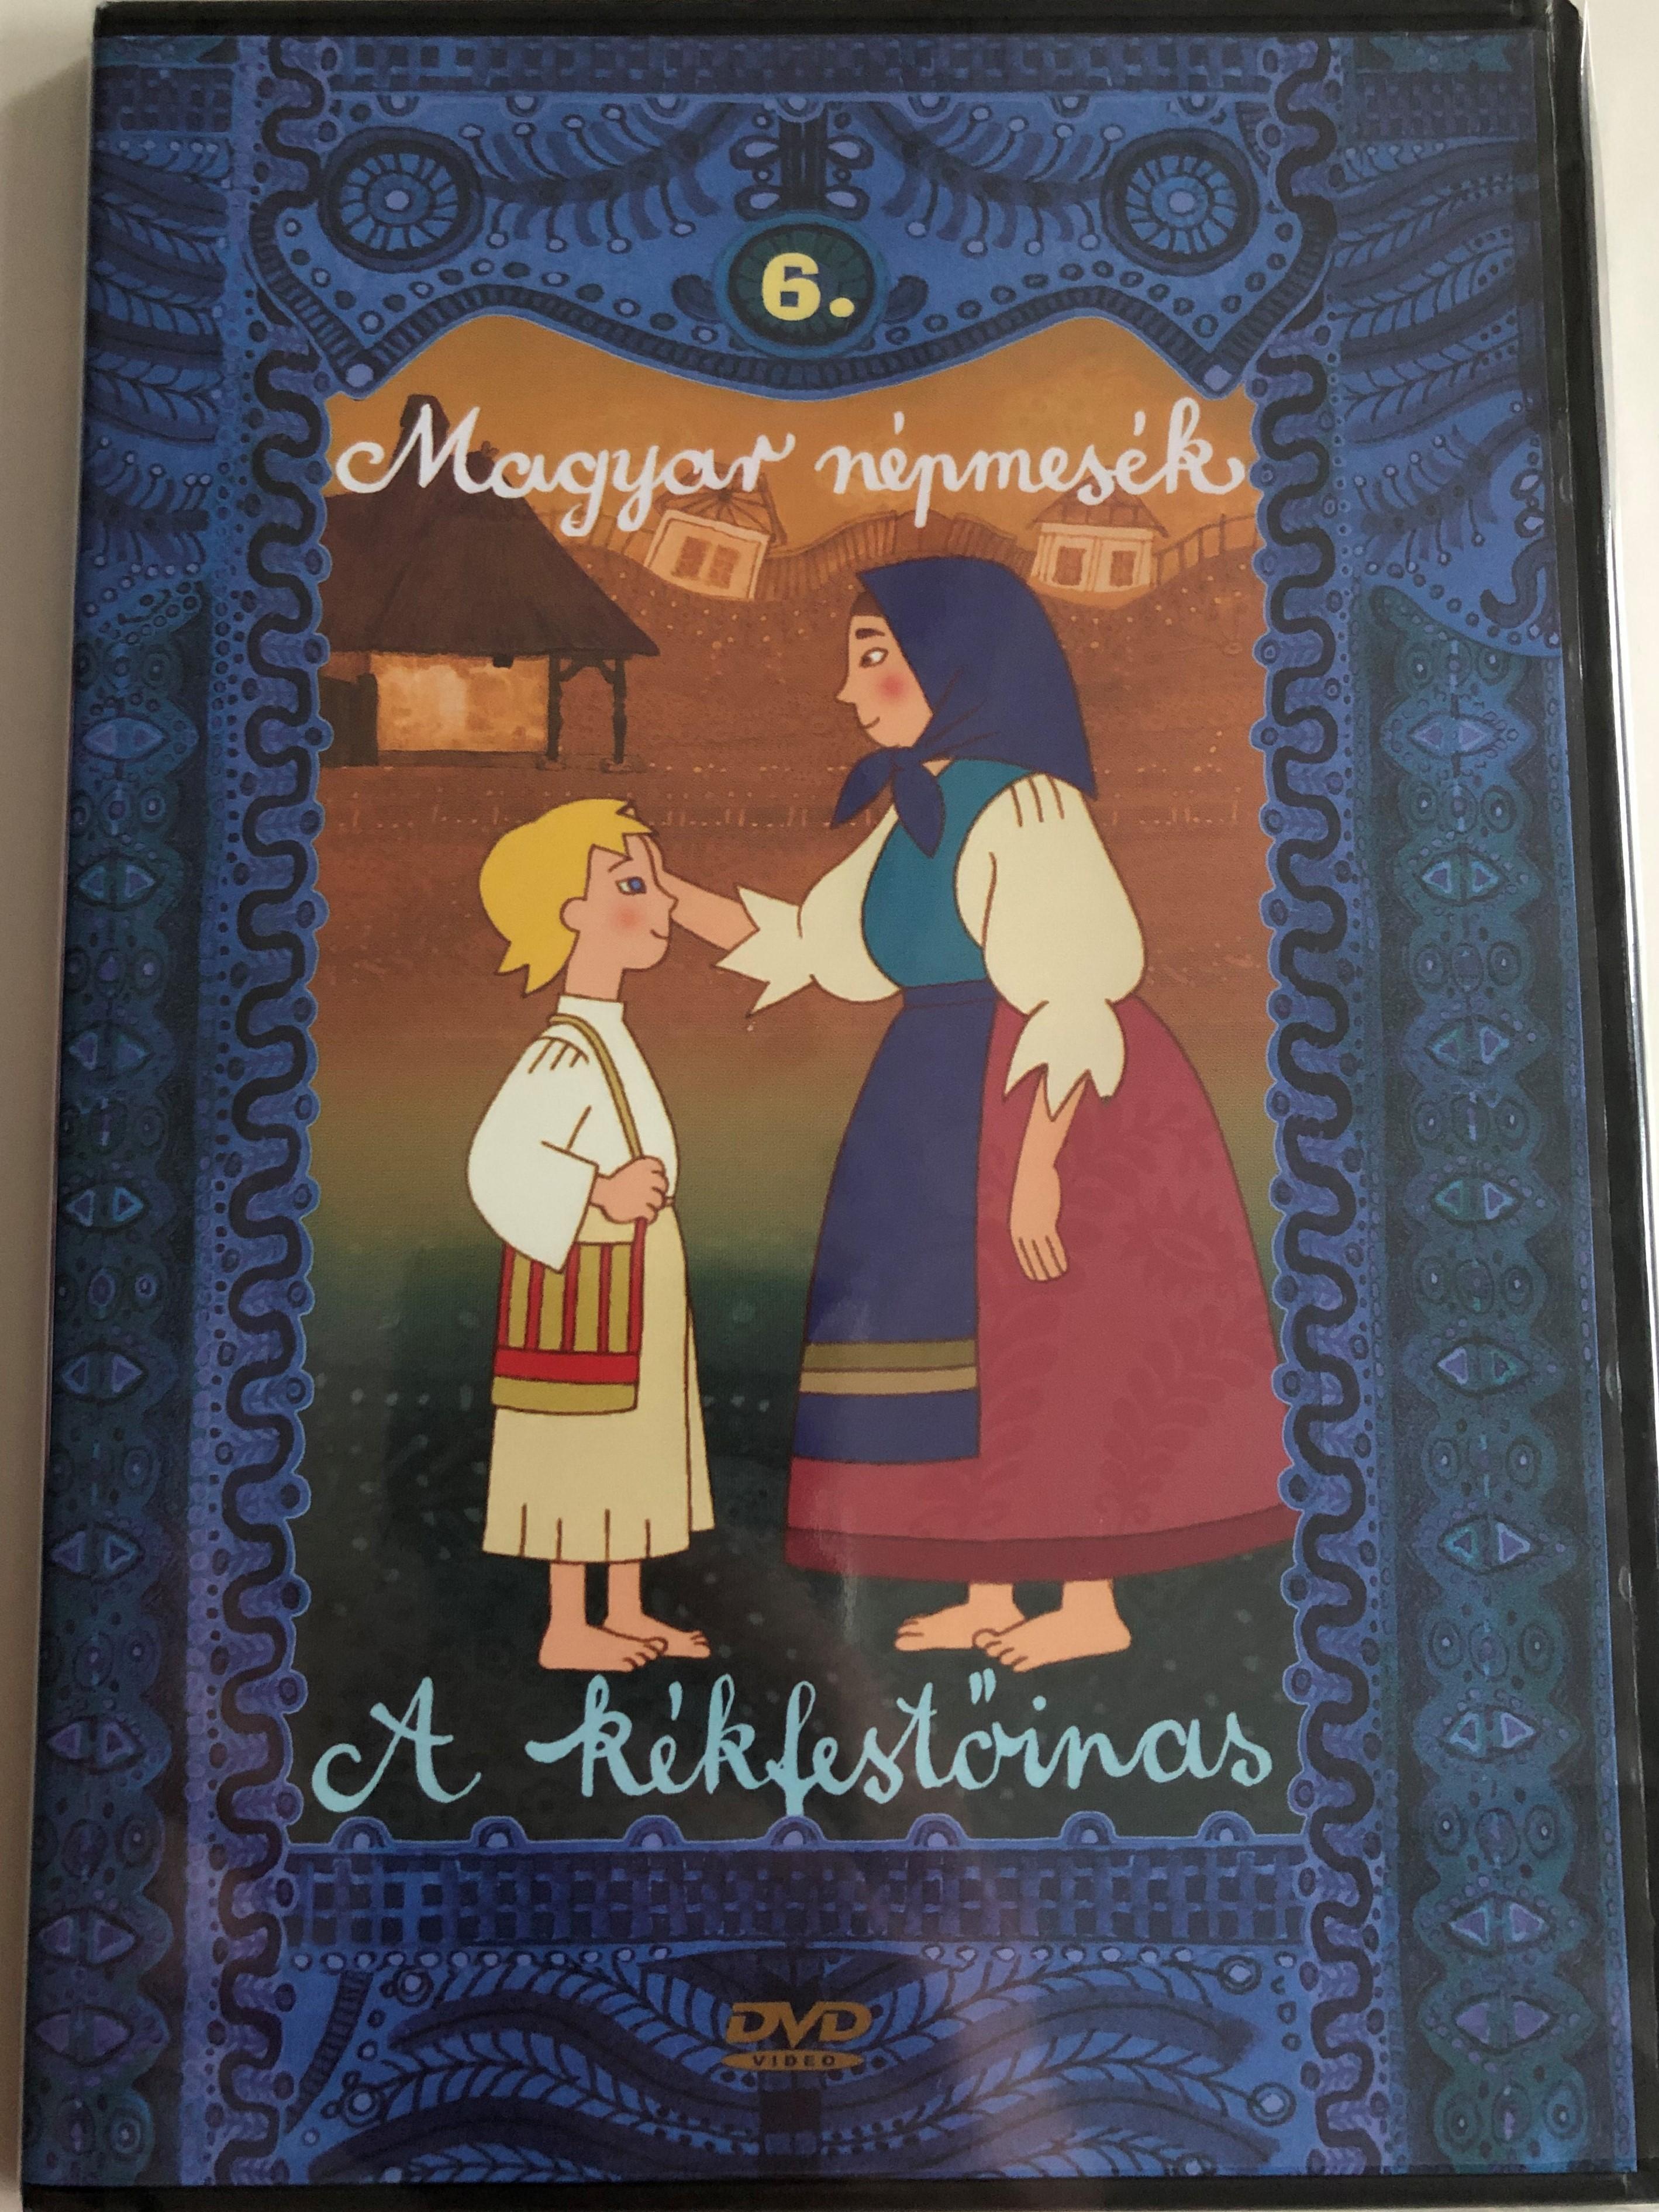 magyar-n-pmes-k-6.-a-k-kpest-inas-dvd-2002-2003-hungarian-folk-tales-for-children-directed-by-horv-th-m-ria-nagy-j-zsef-read-by-szab-gyula-1-.jpg